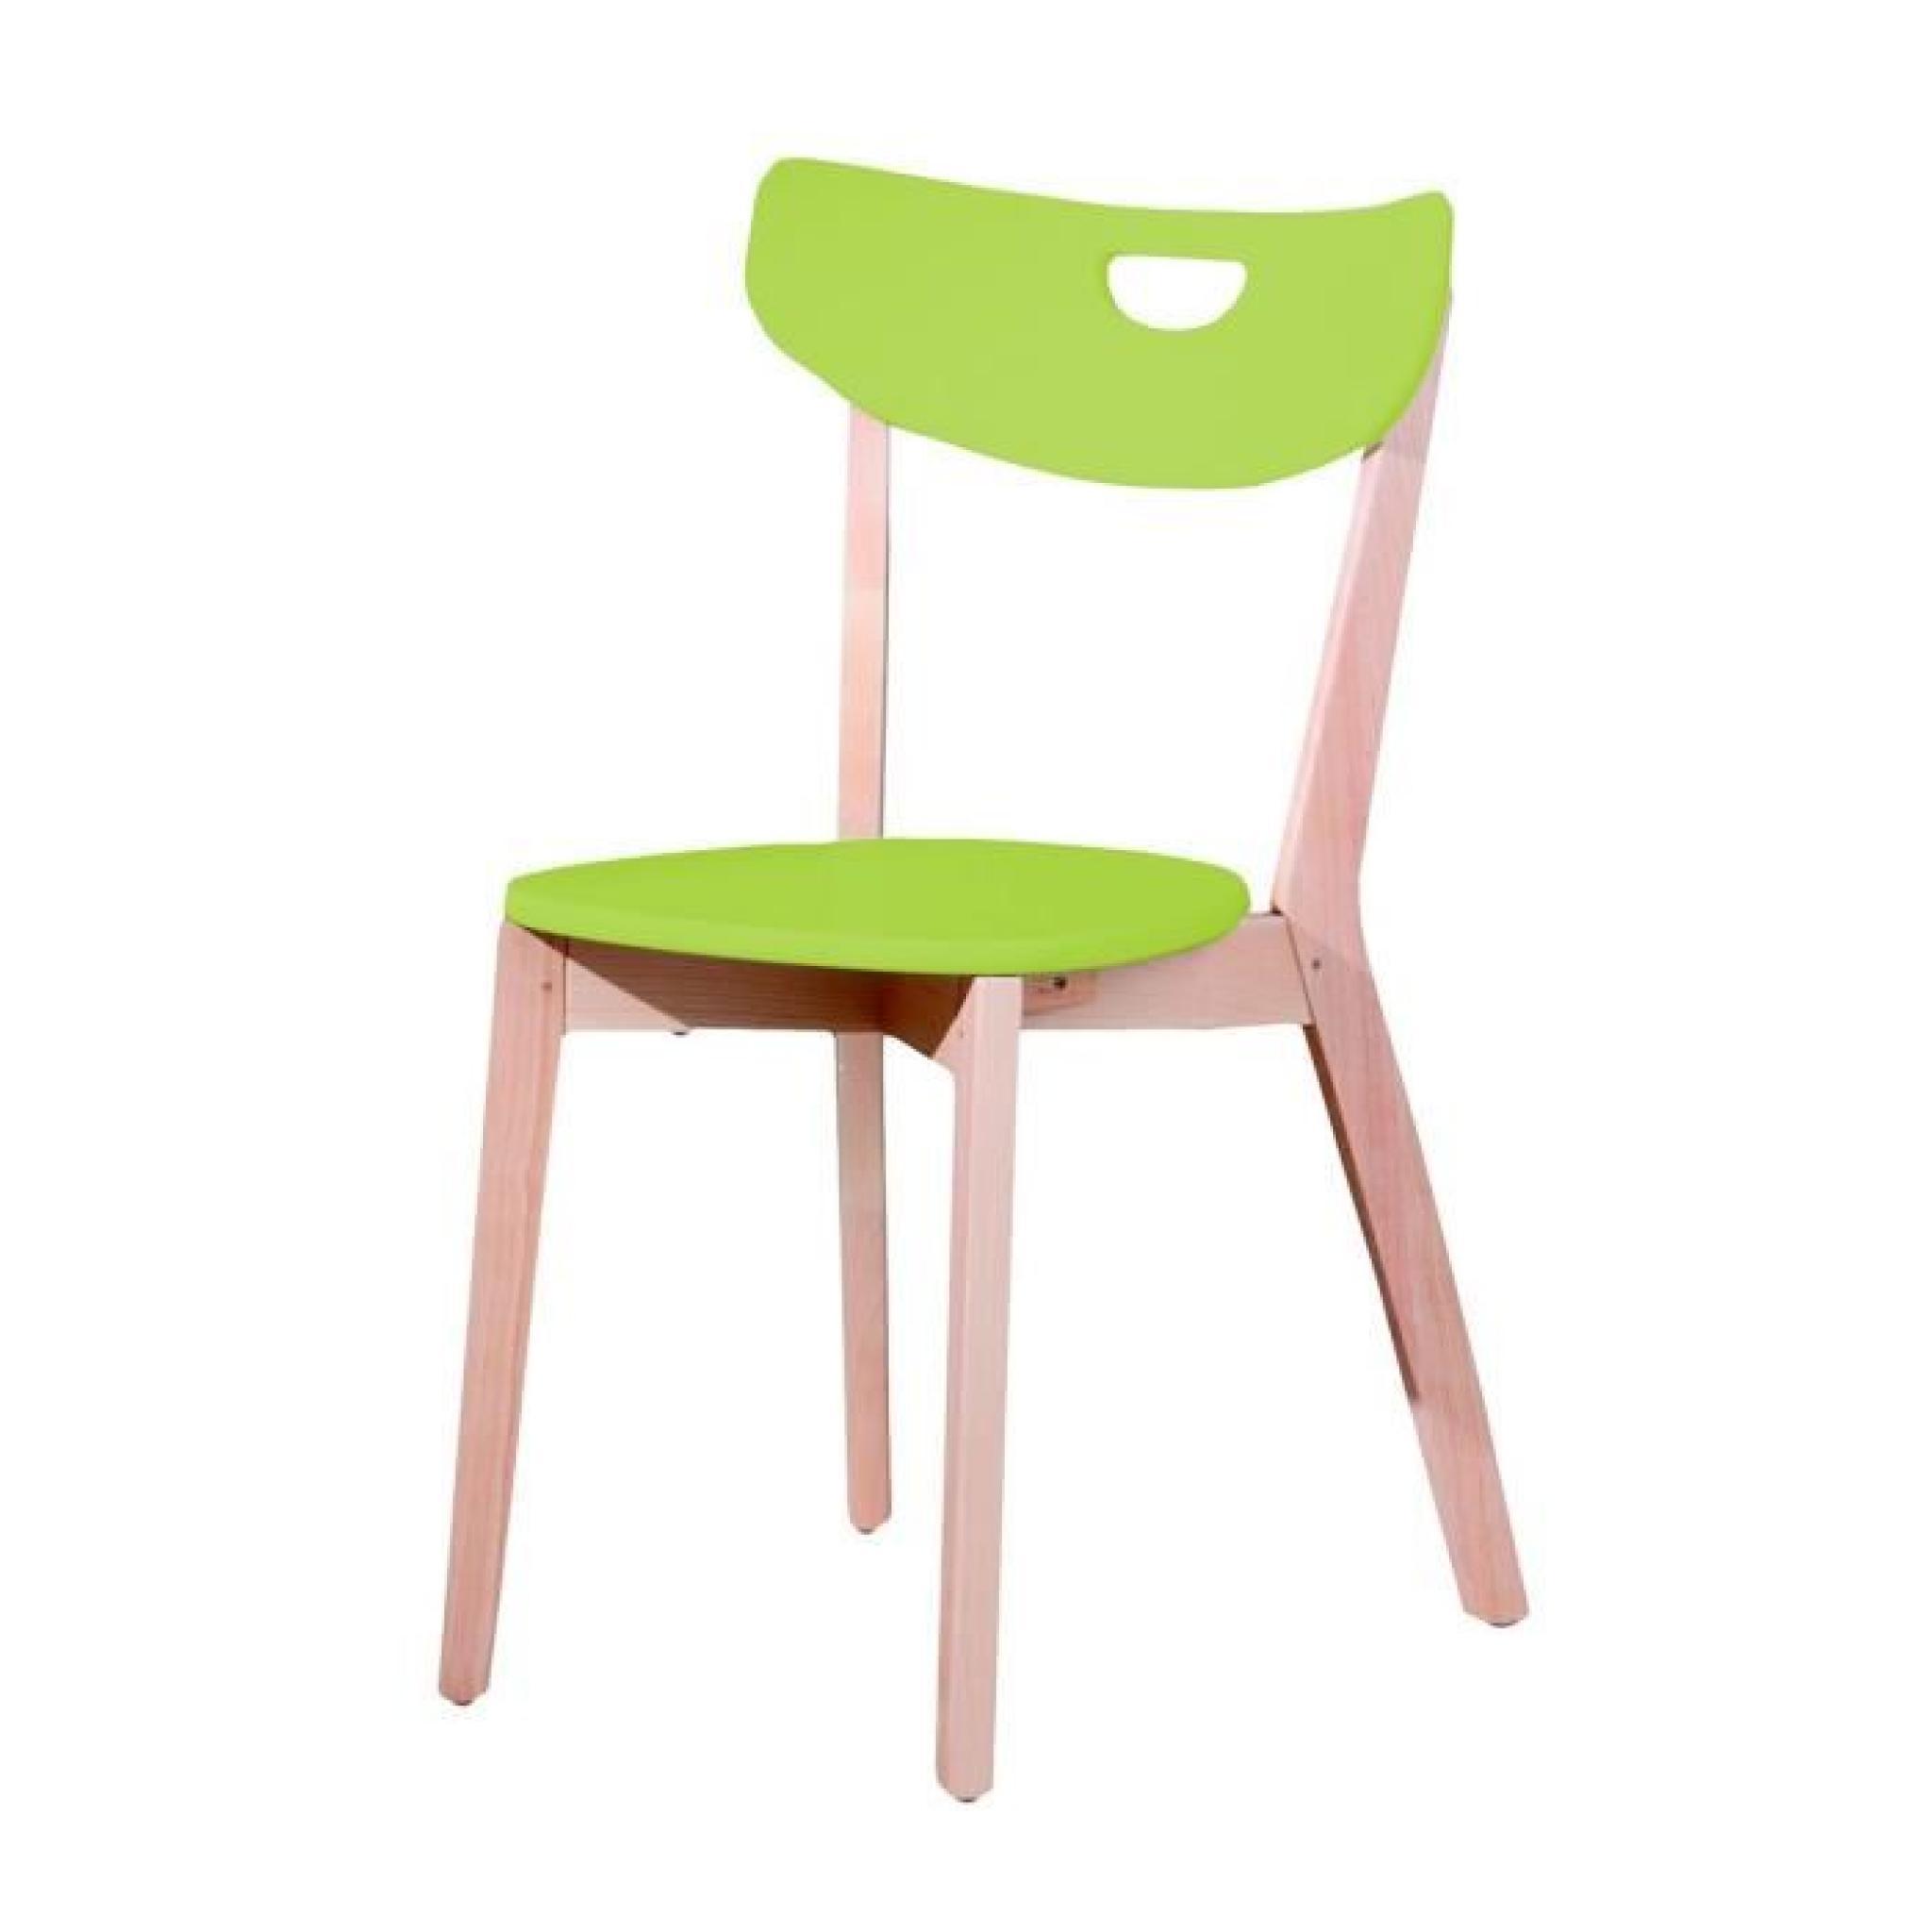 Chaise Design Verte Scandi ATYLIA Couleur Vert